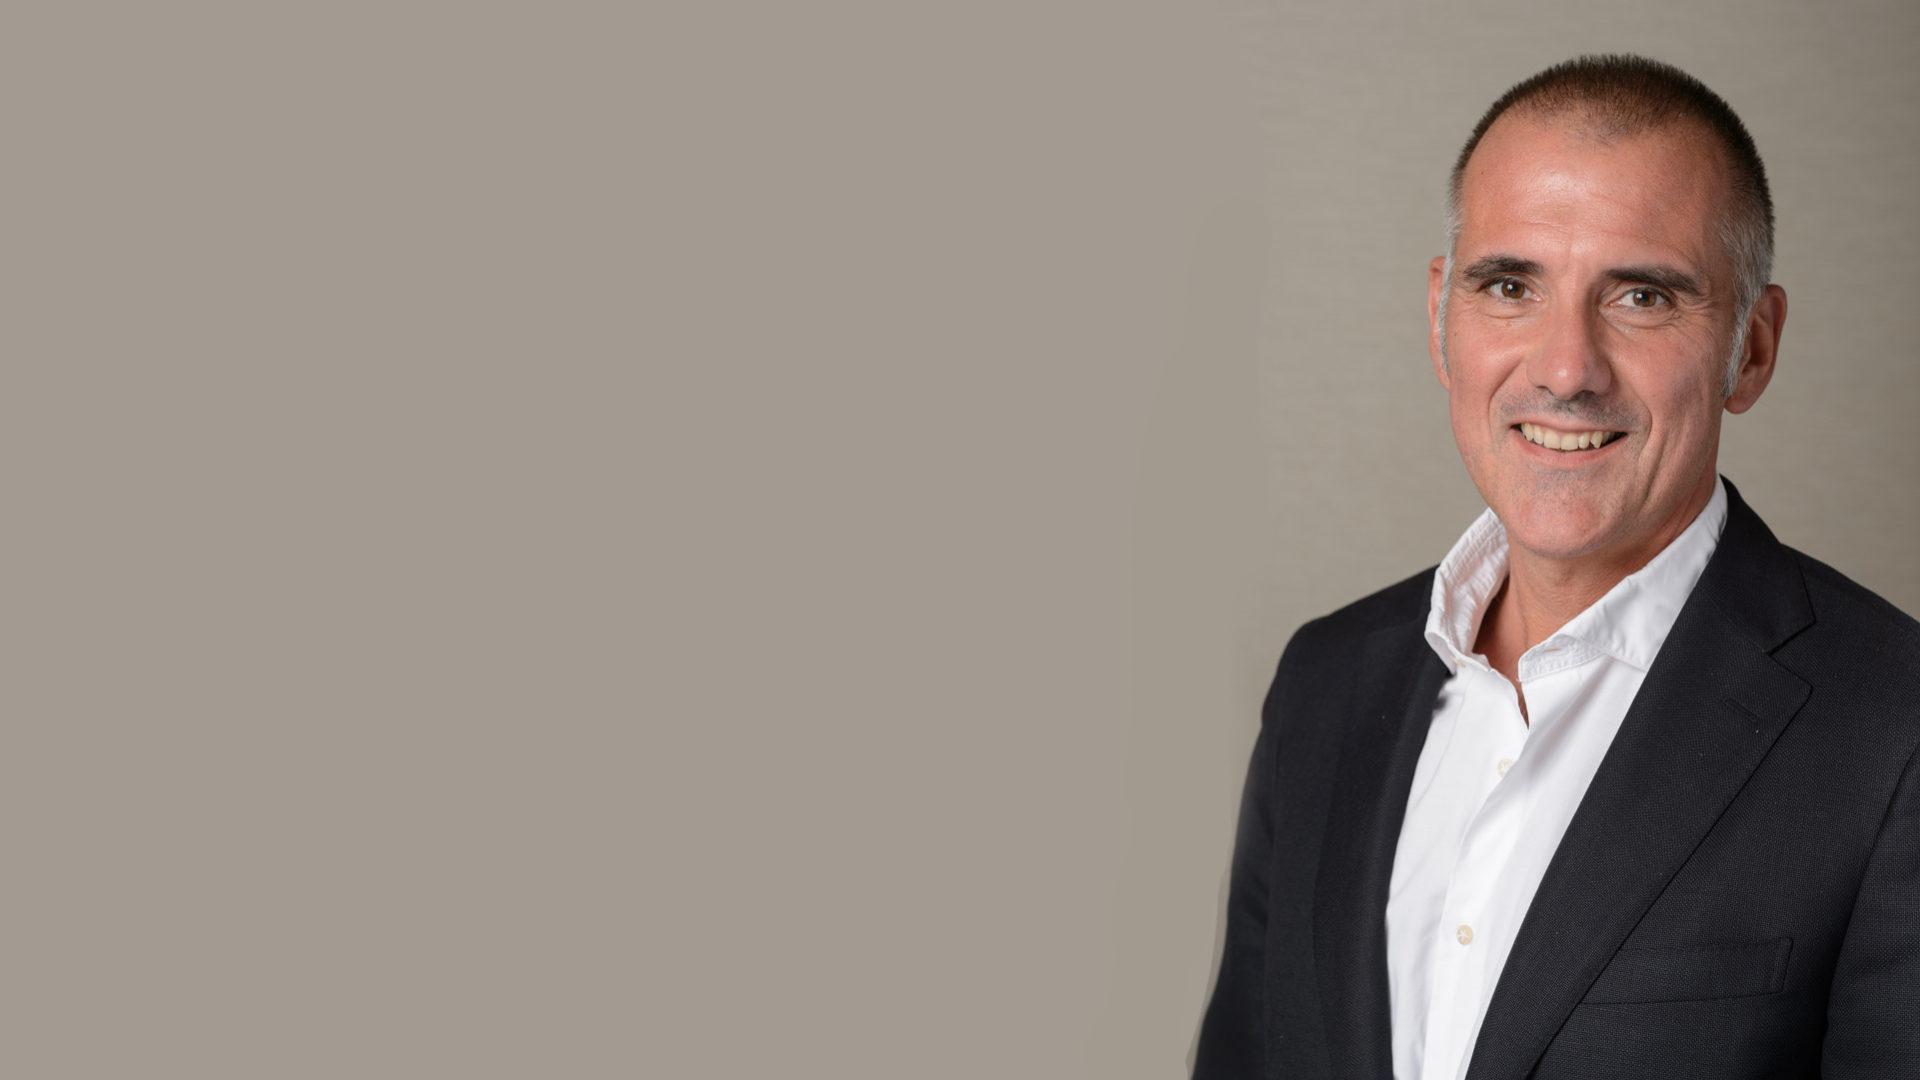 1-Paolo Delnevo, Vice President PTC Southern Europe